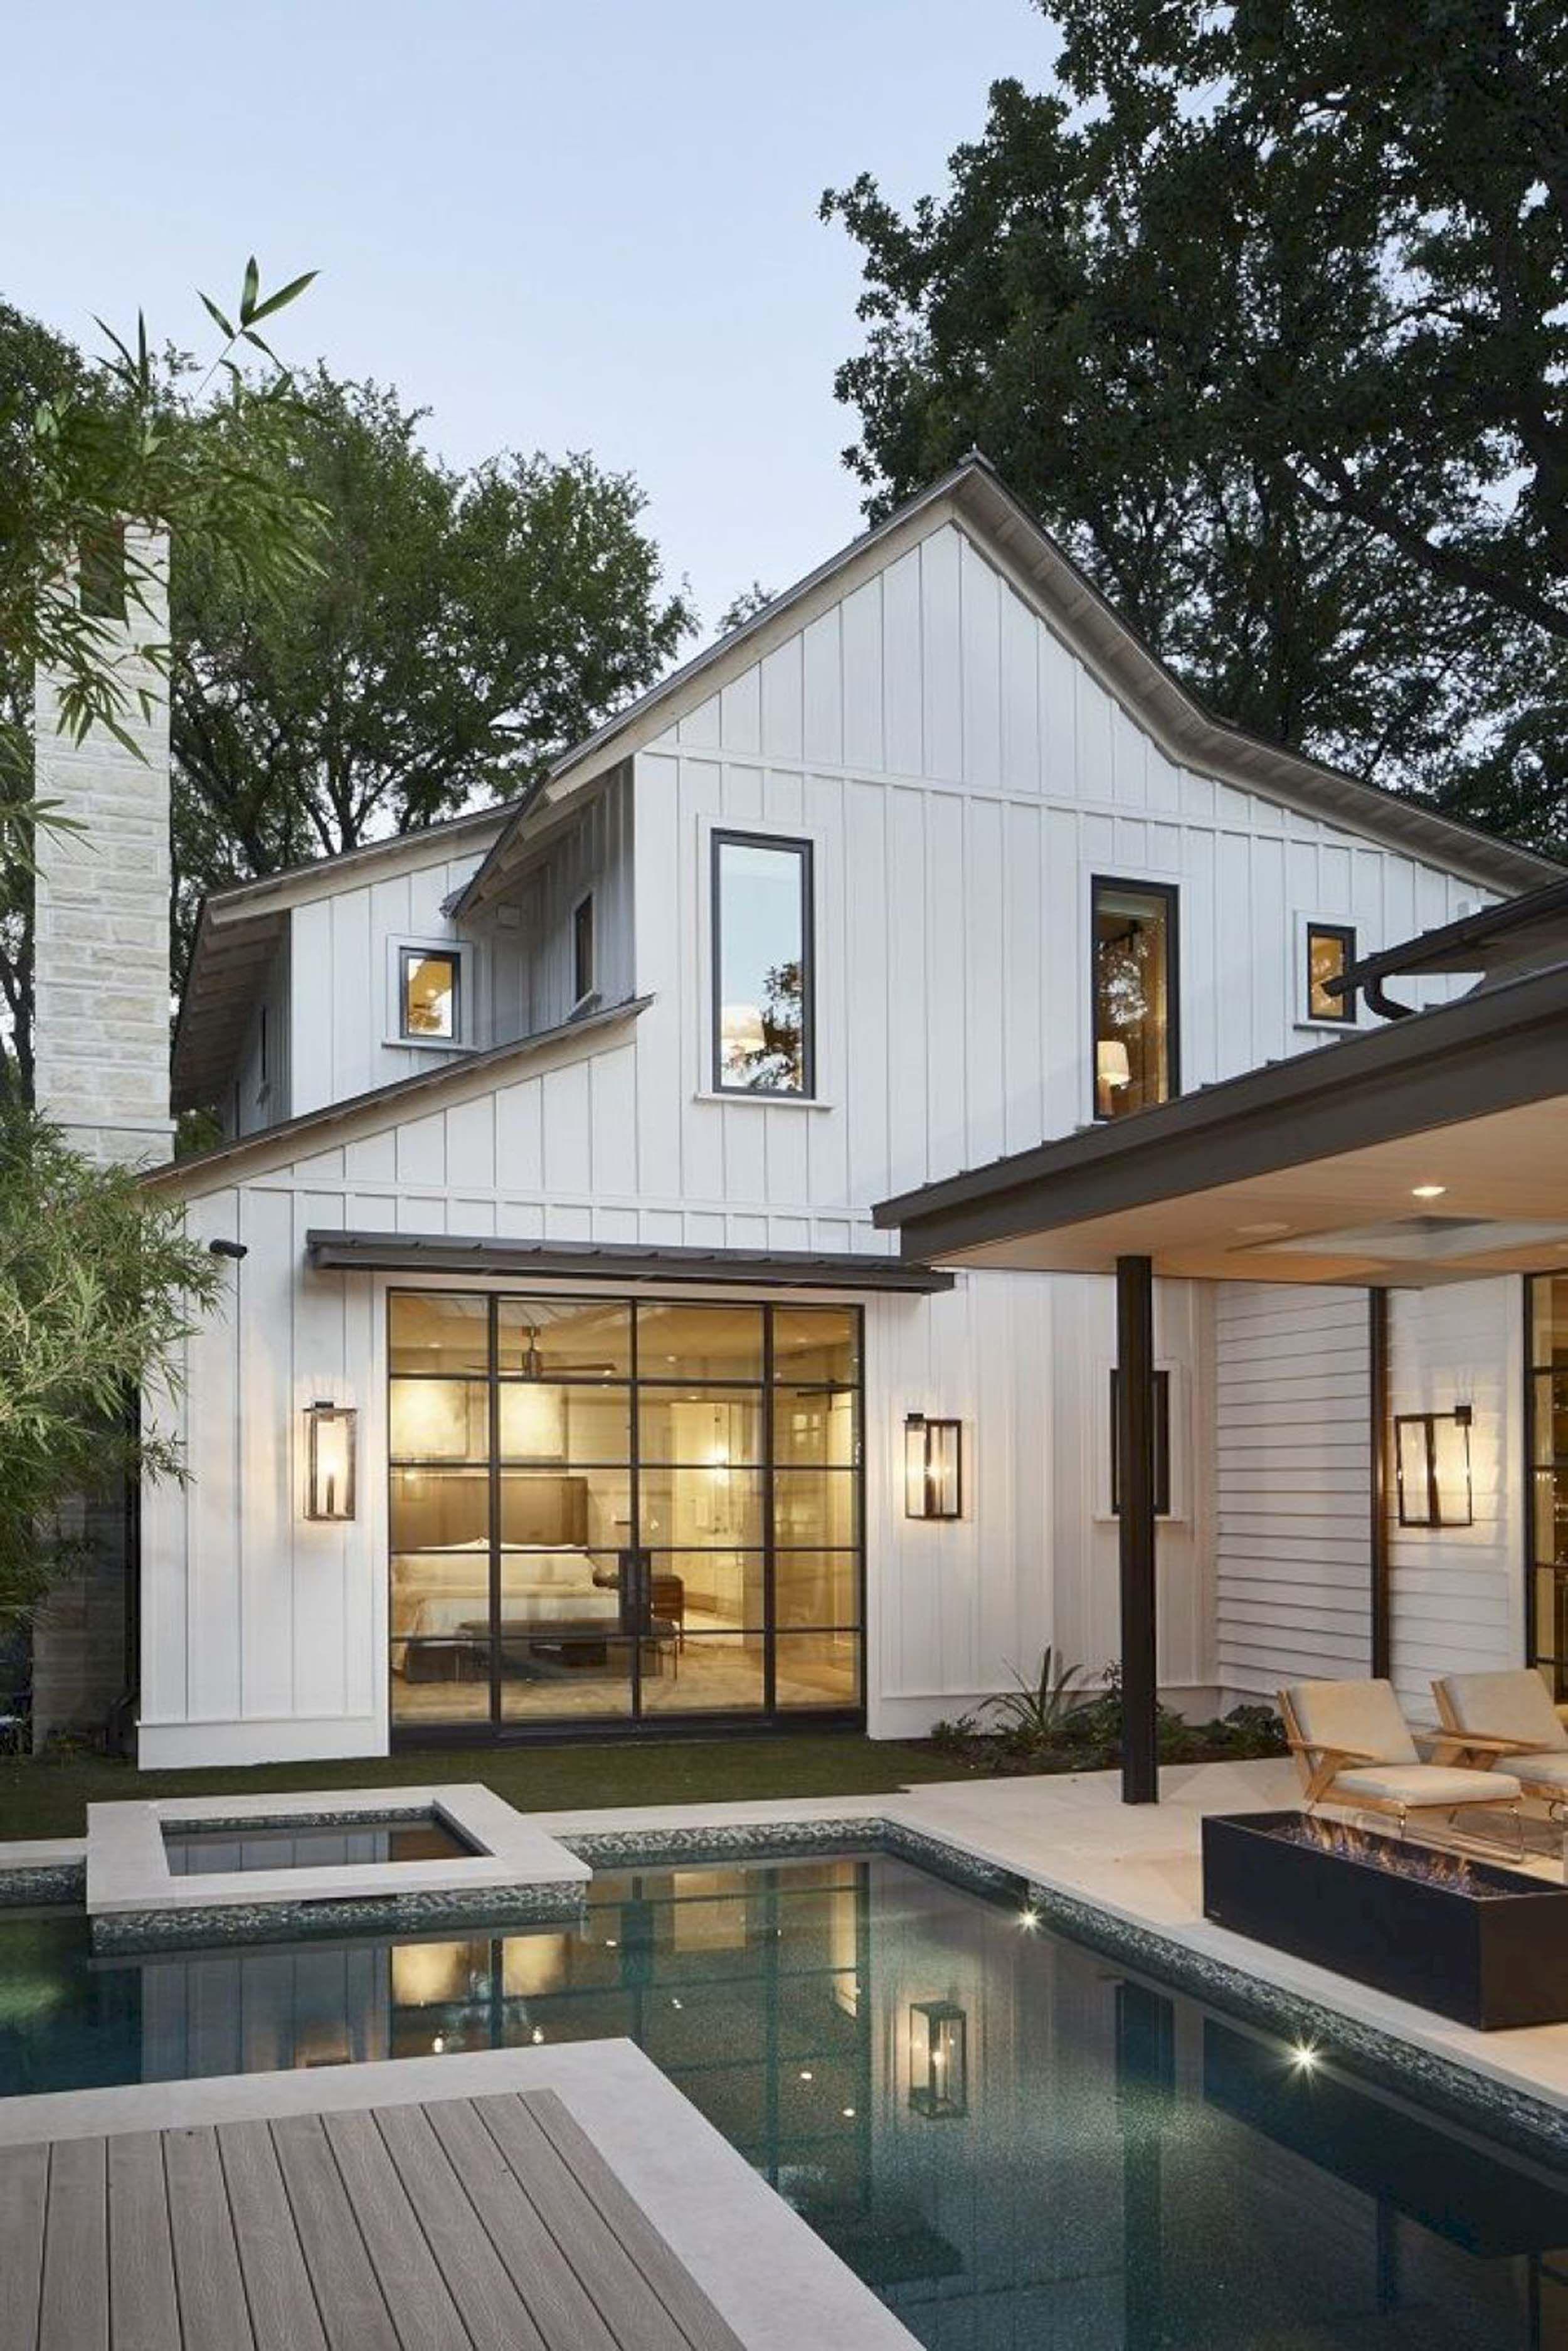 I Design, You Decide: The Mountain House Exterior - Emily Henderson